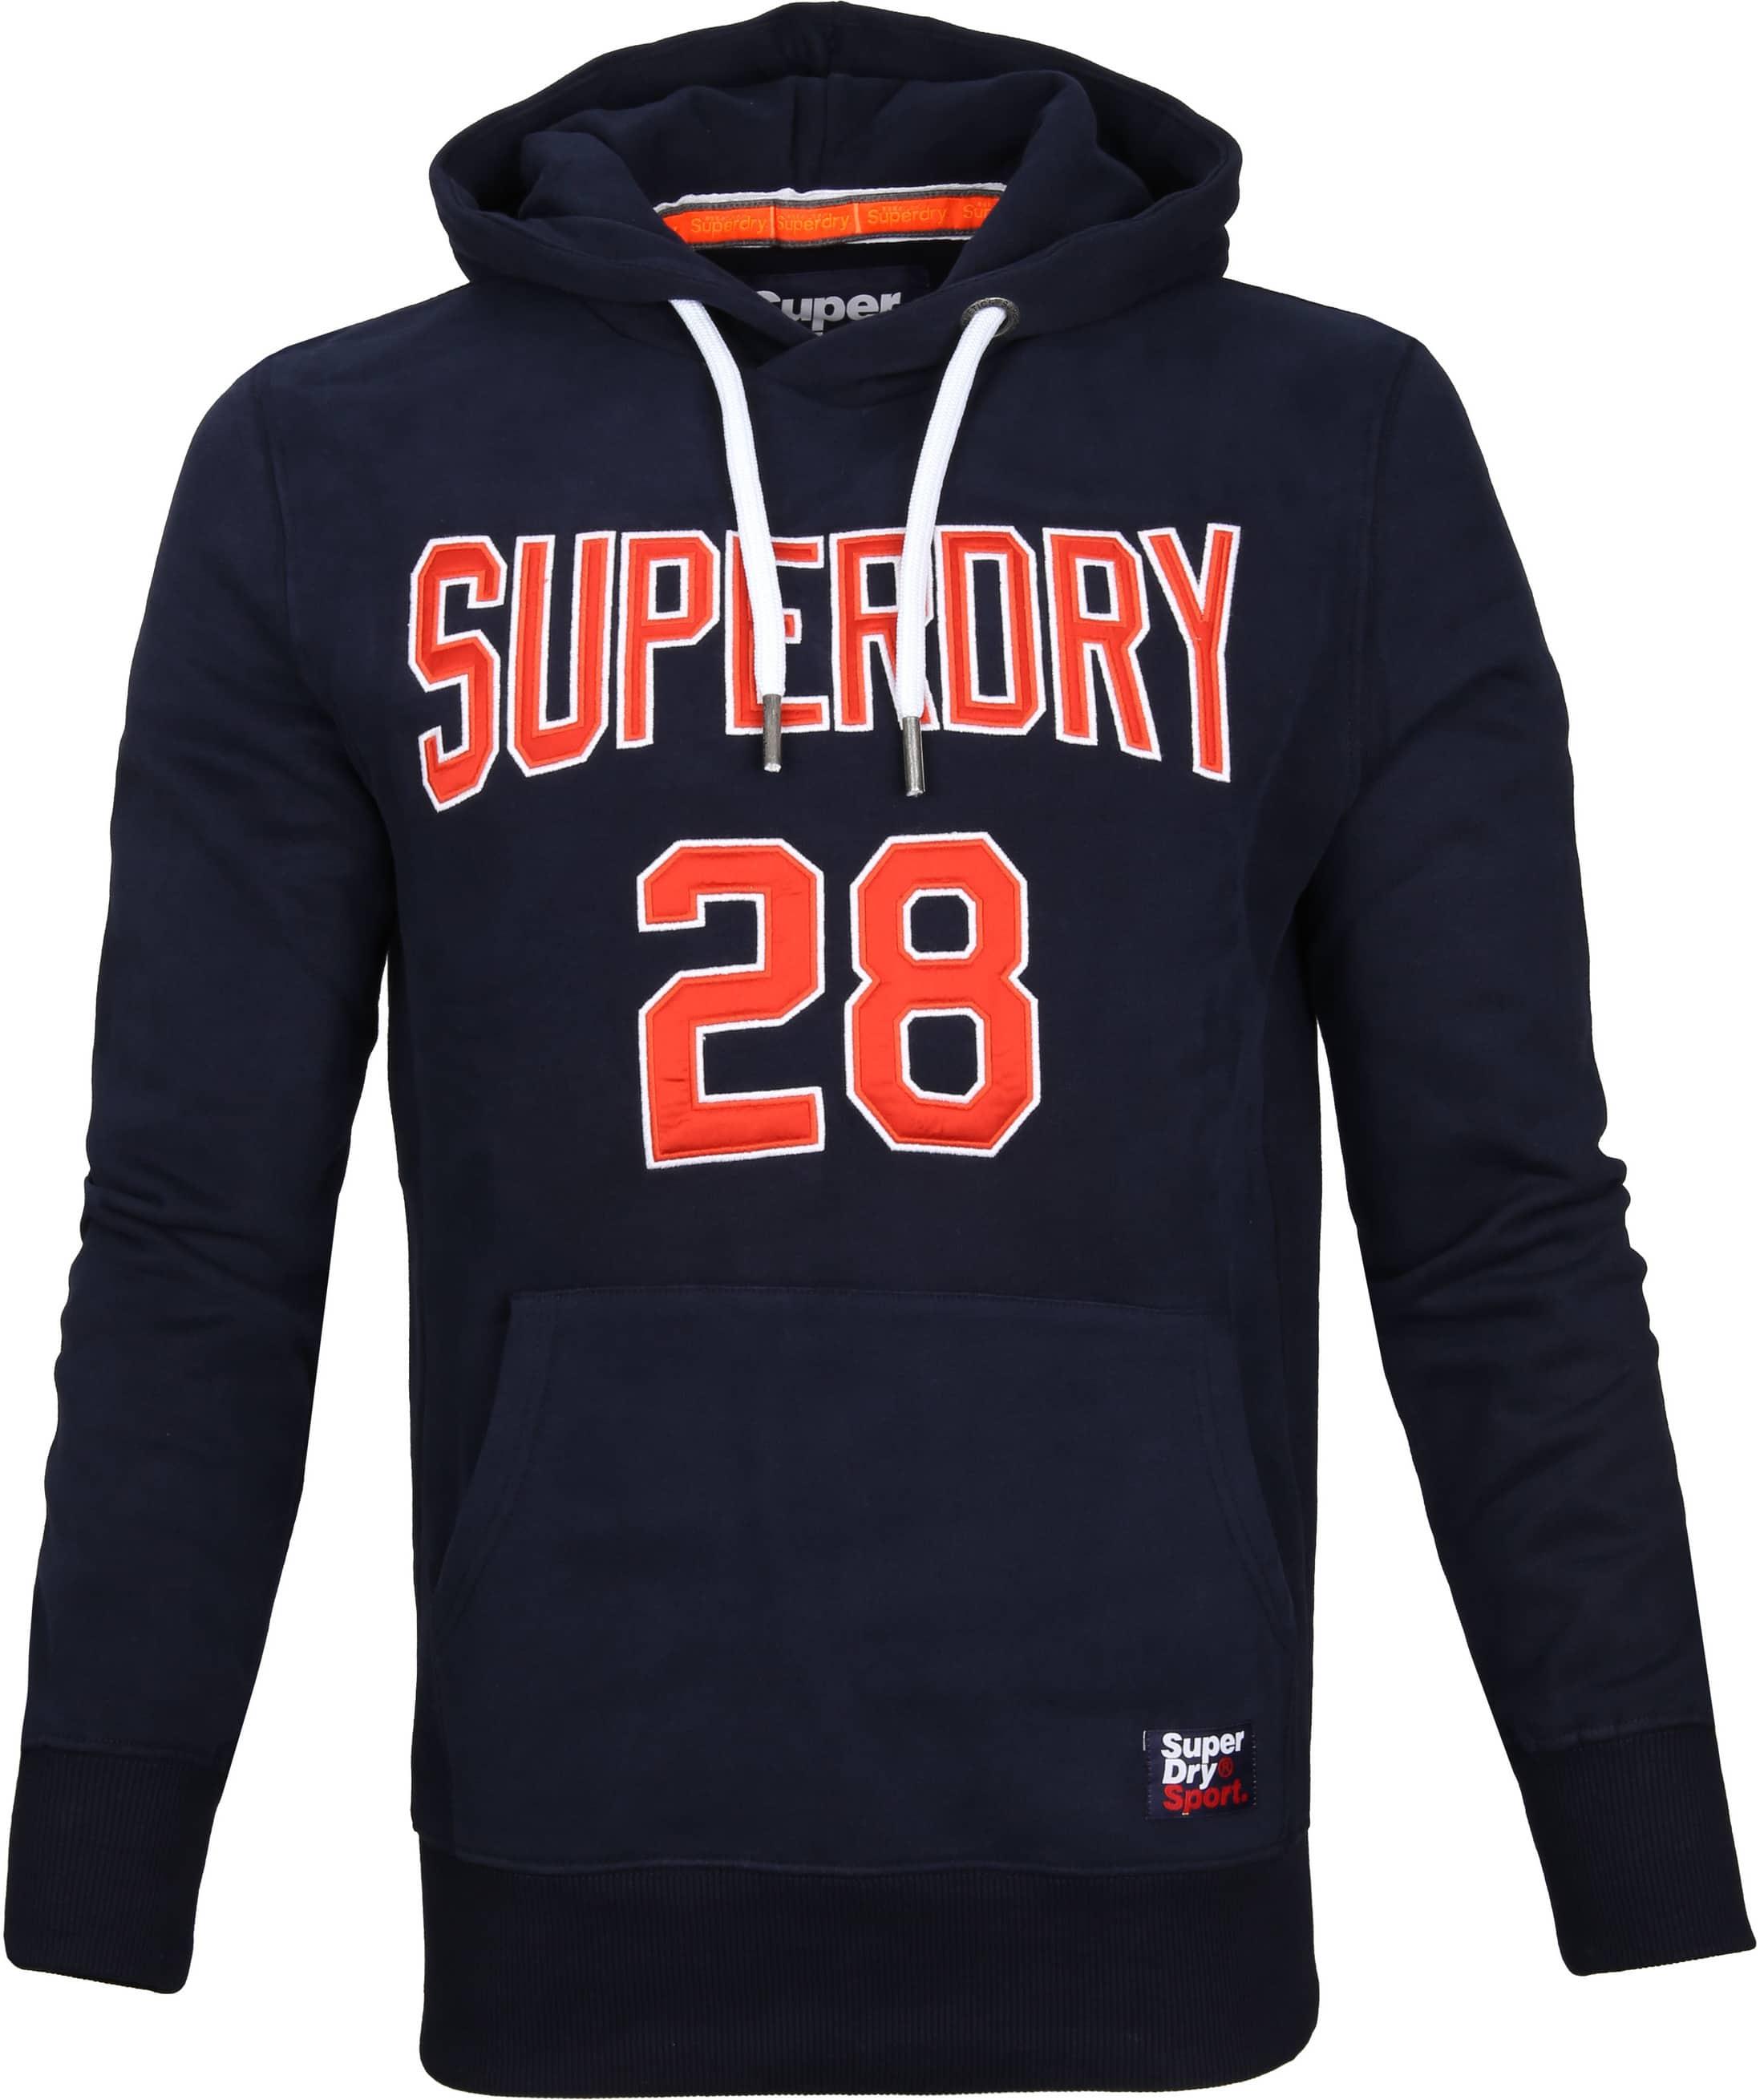 Superdry Sweater Logo Donkerblauw foto 0